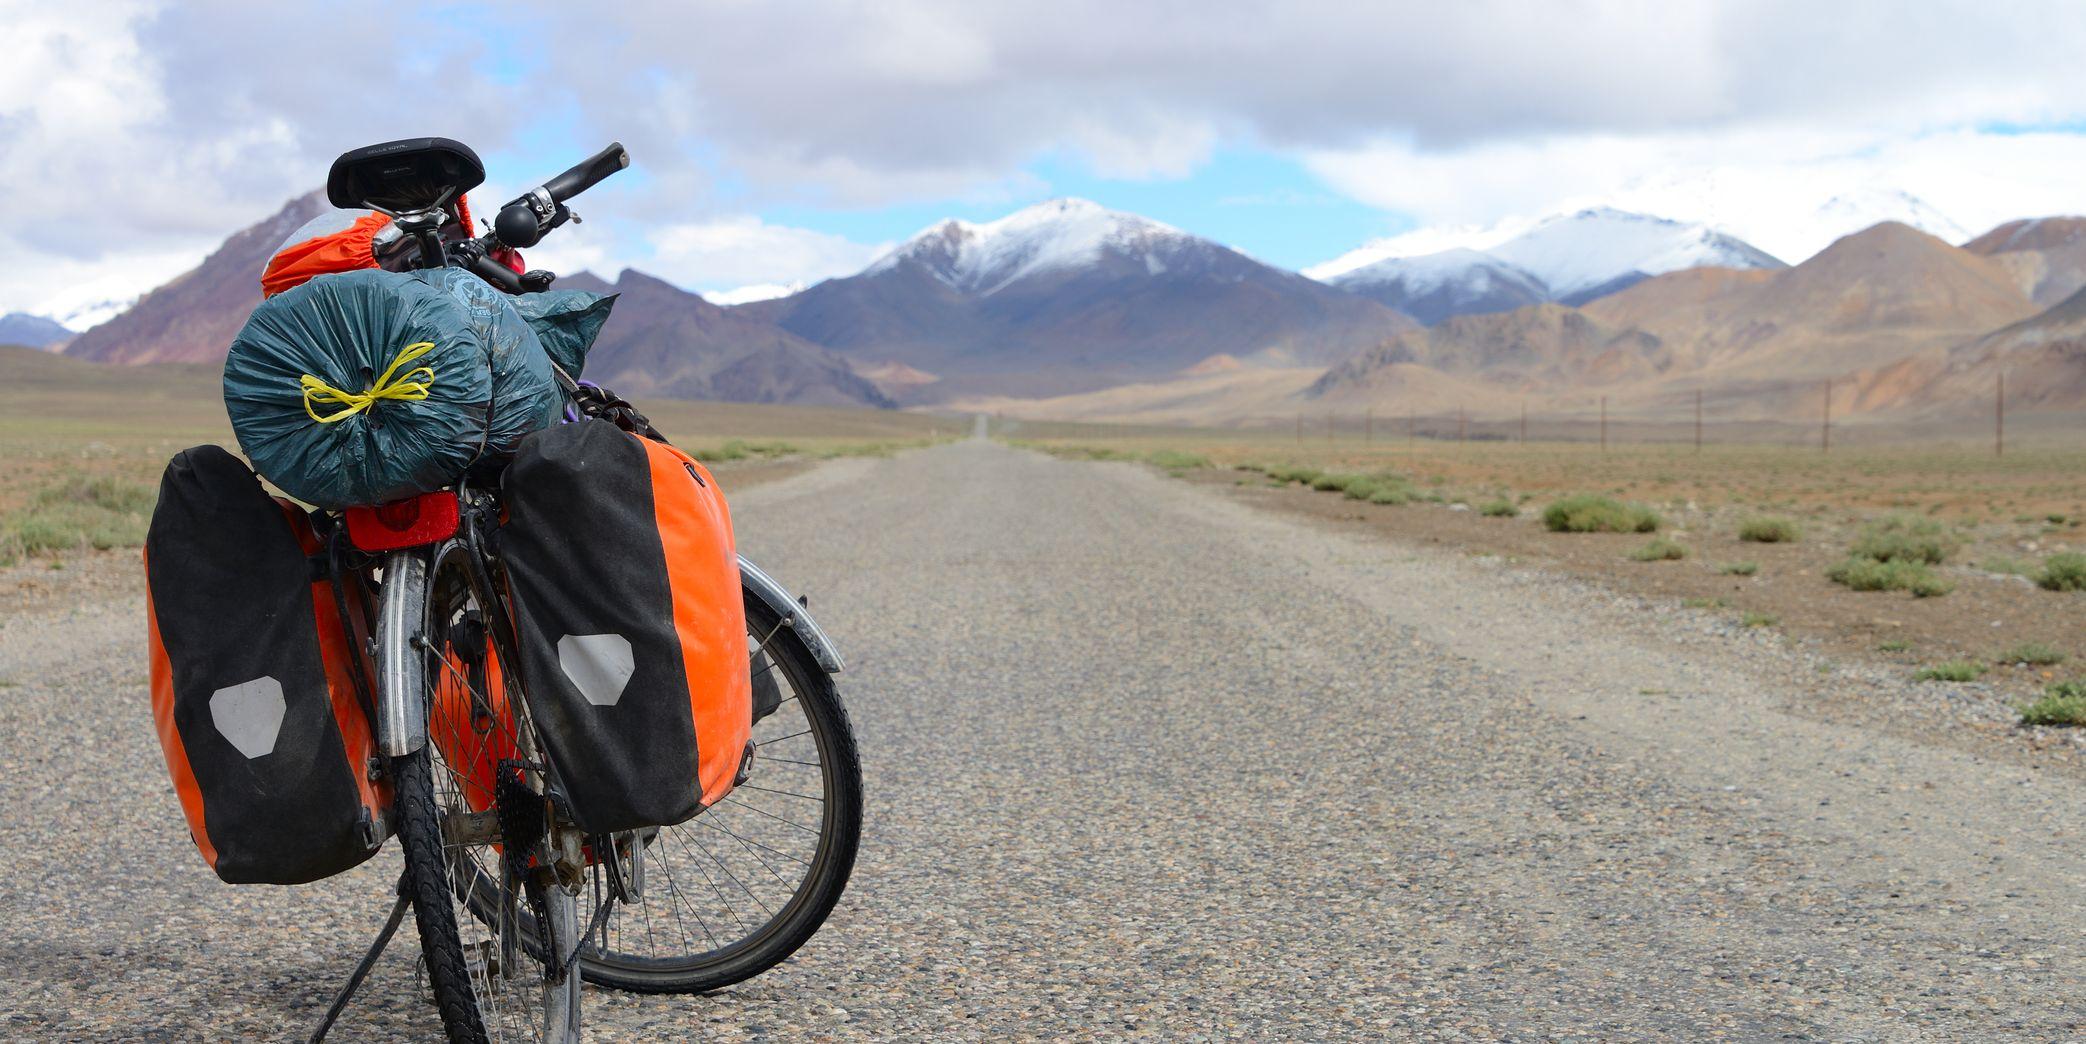 Long distance cycling on M41 Pamir Highway, Pamir Mountain Range, Tajikistan